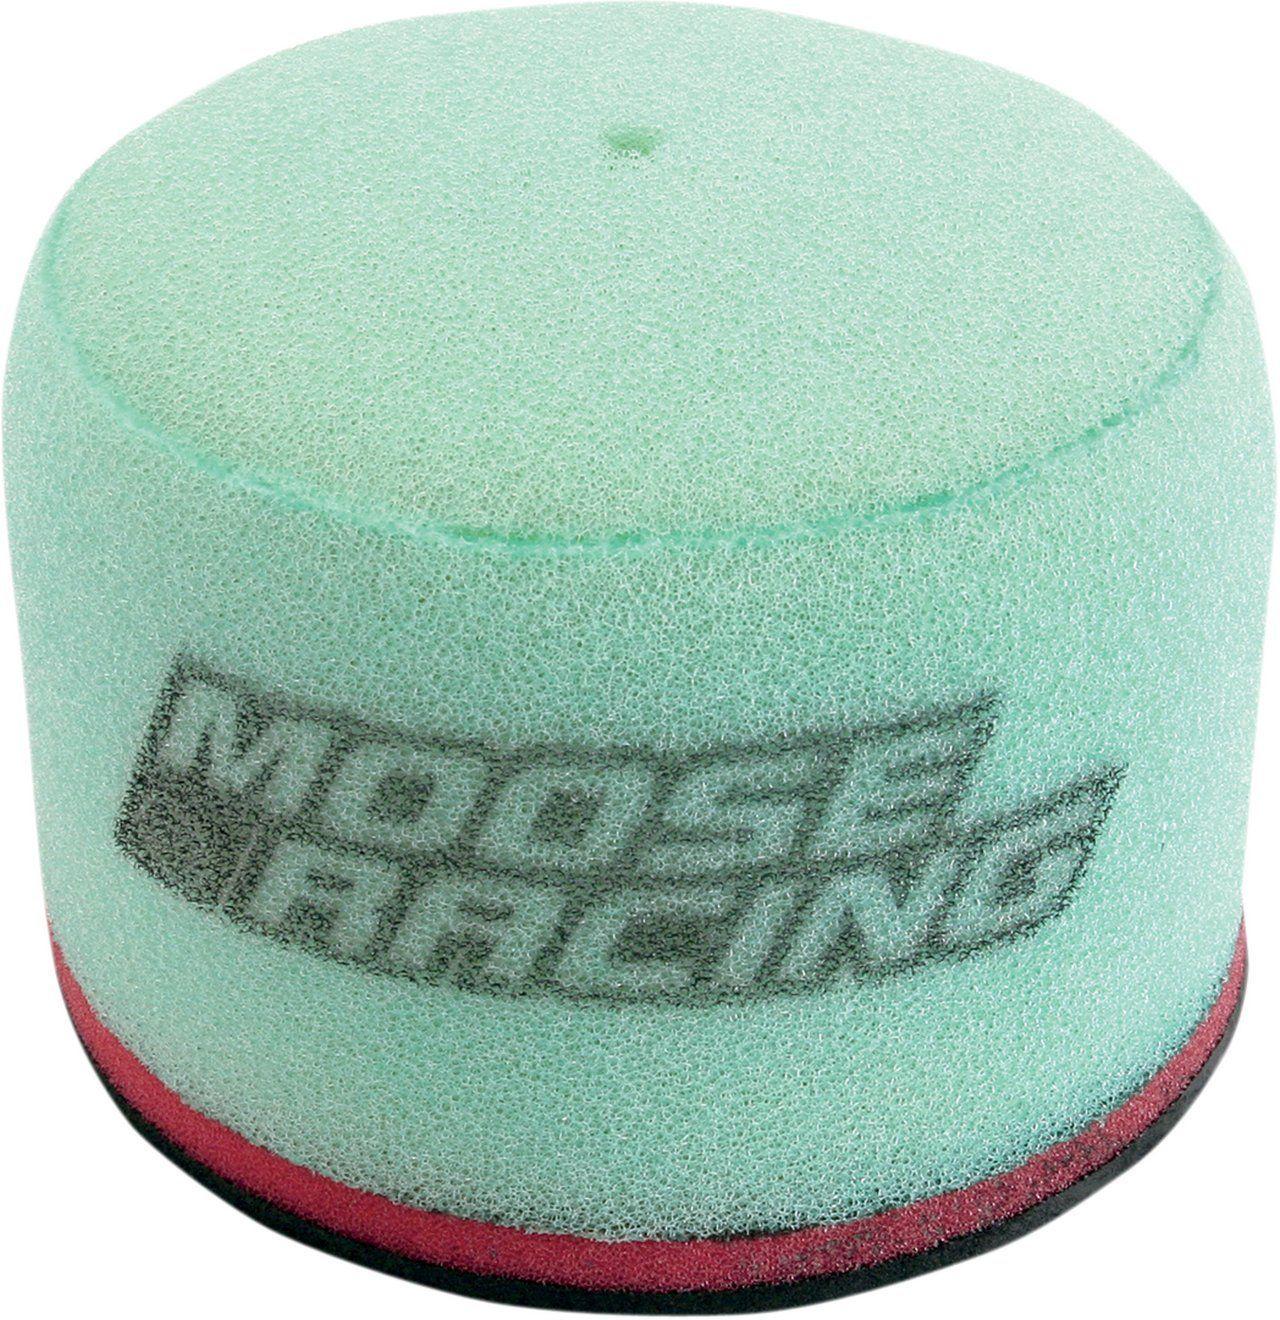 【MOOSE RACING】PRECISION PRE-OILED 空氣濾芯 [1011-0835] - 「Webike-摩托百貨」